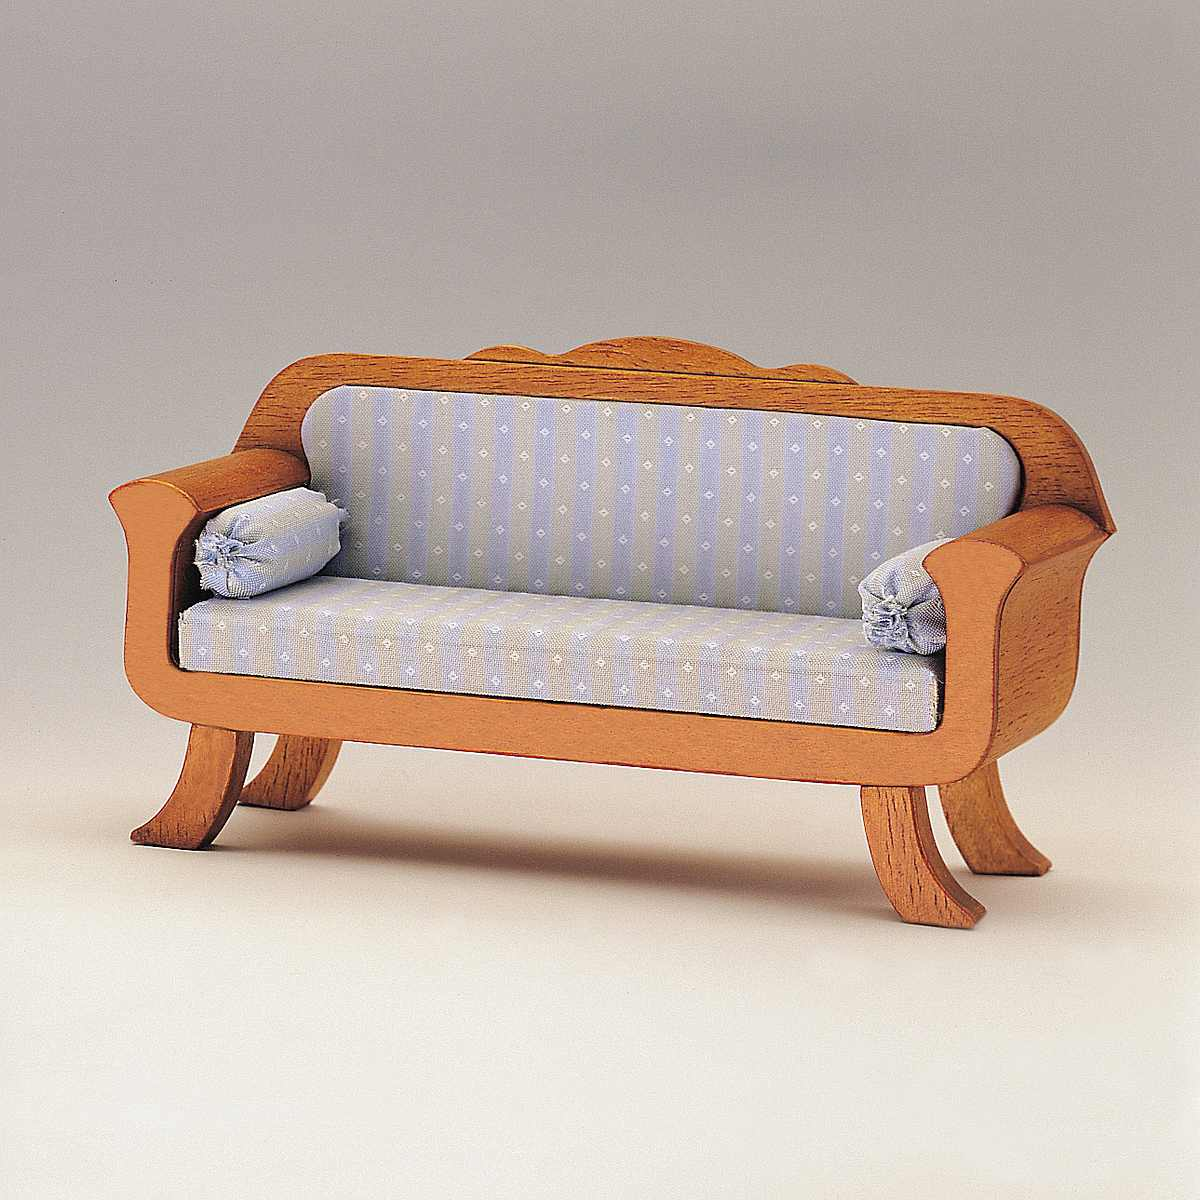 biedermeier sofa 40092. Black Bedroom Furniture Sets. Home Design Ideas